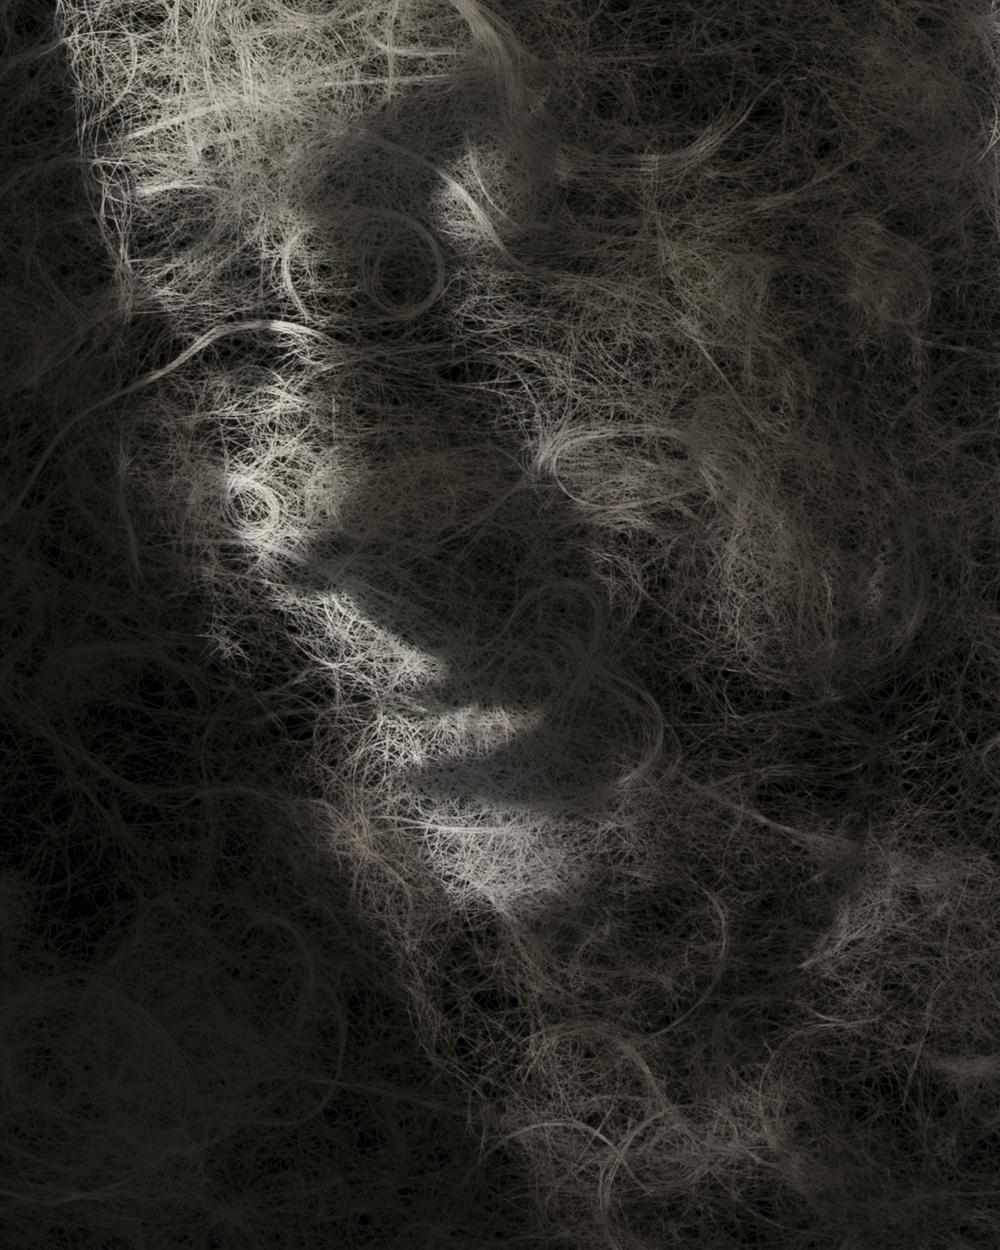 Eva , 2014, Chromogenic print, 35 x 28 cm